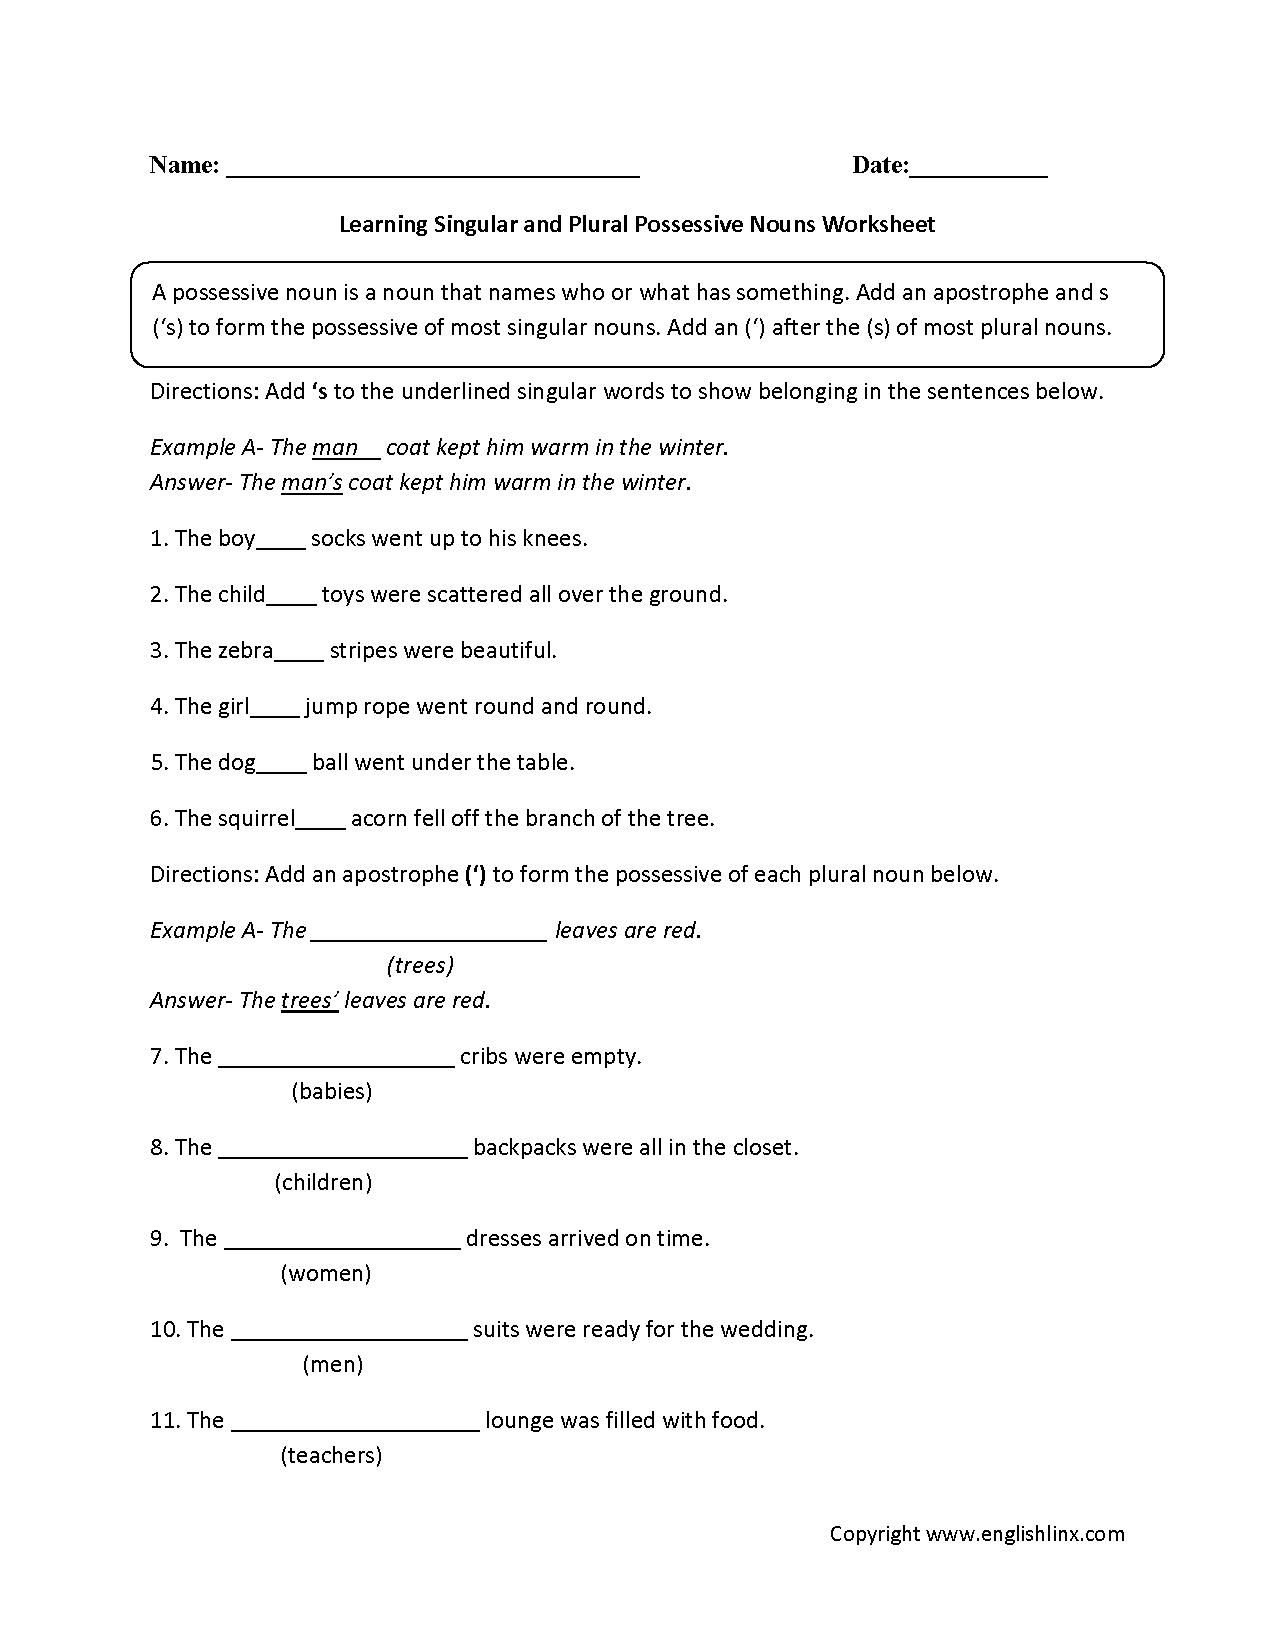 Possessive Nouns Worksheets Free The Best Worksheets Image